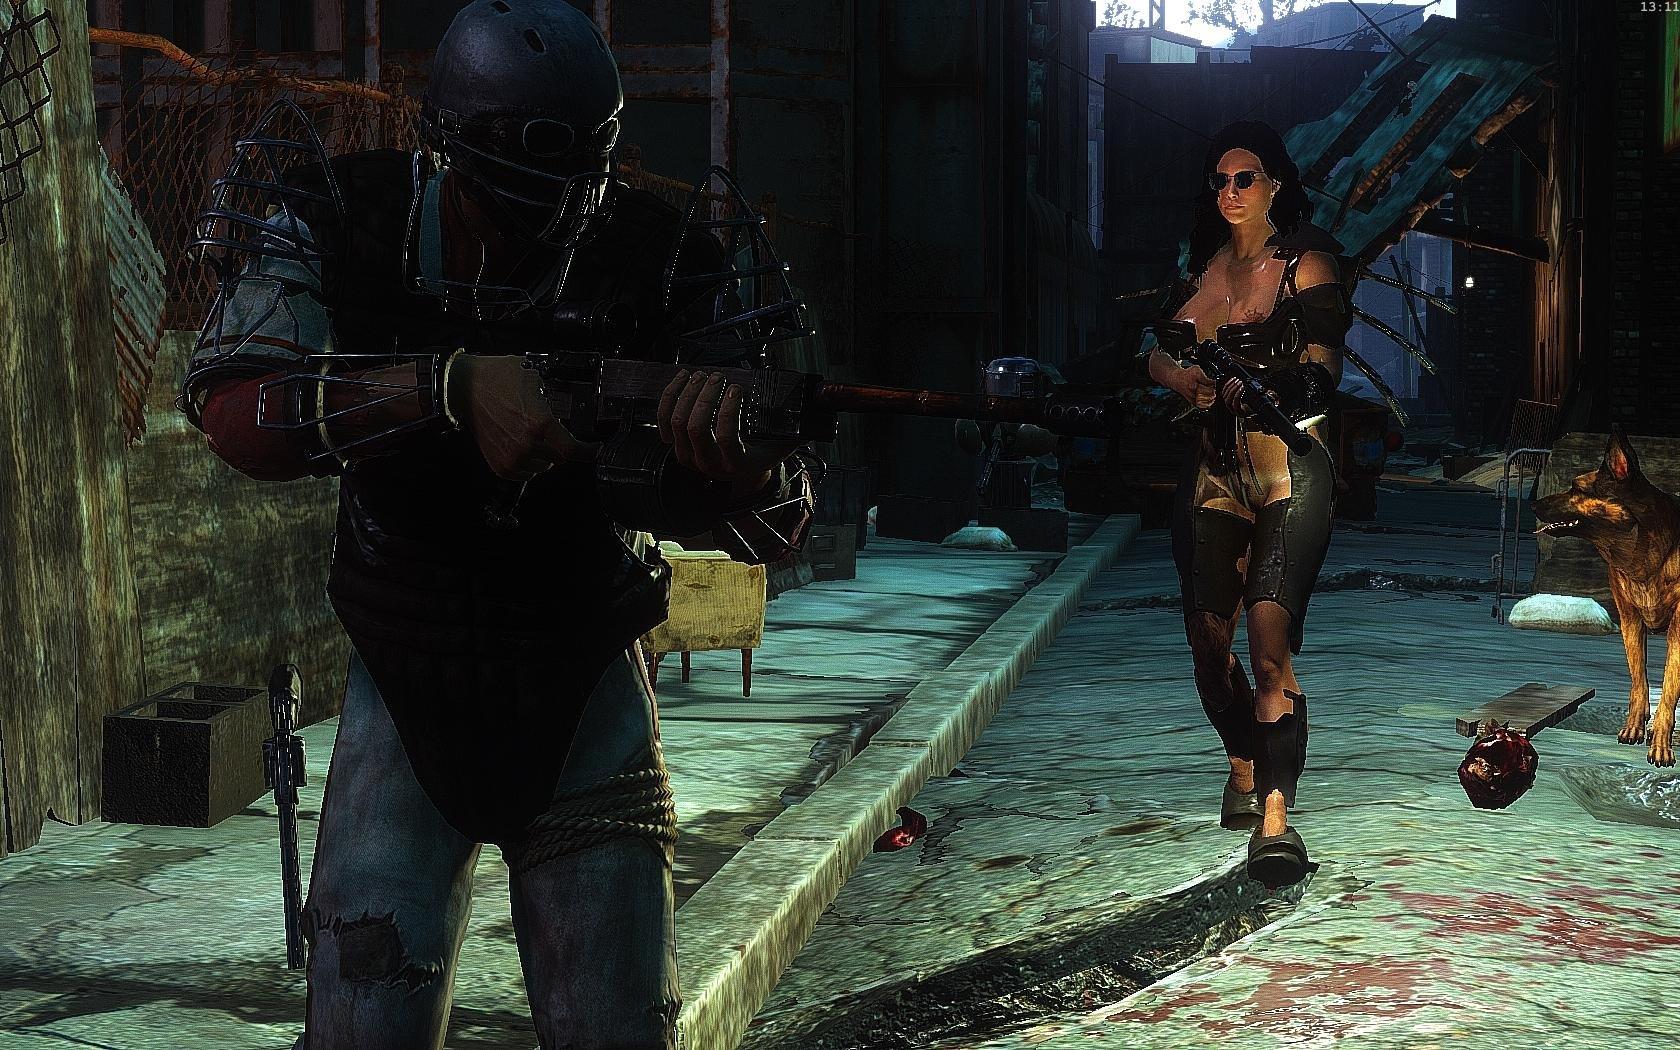 Fallout4 2019-02-07 13-11-13-54